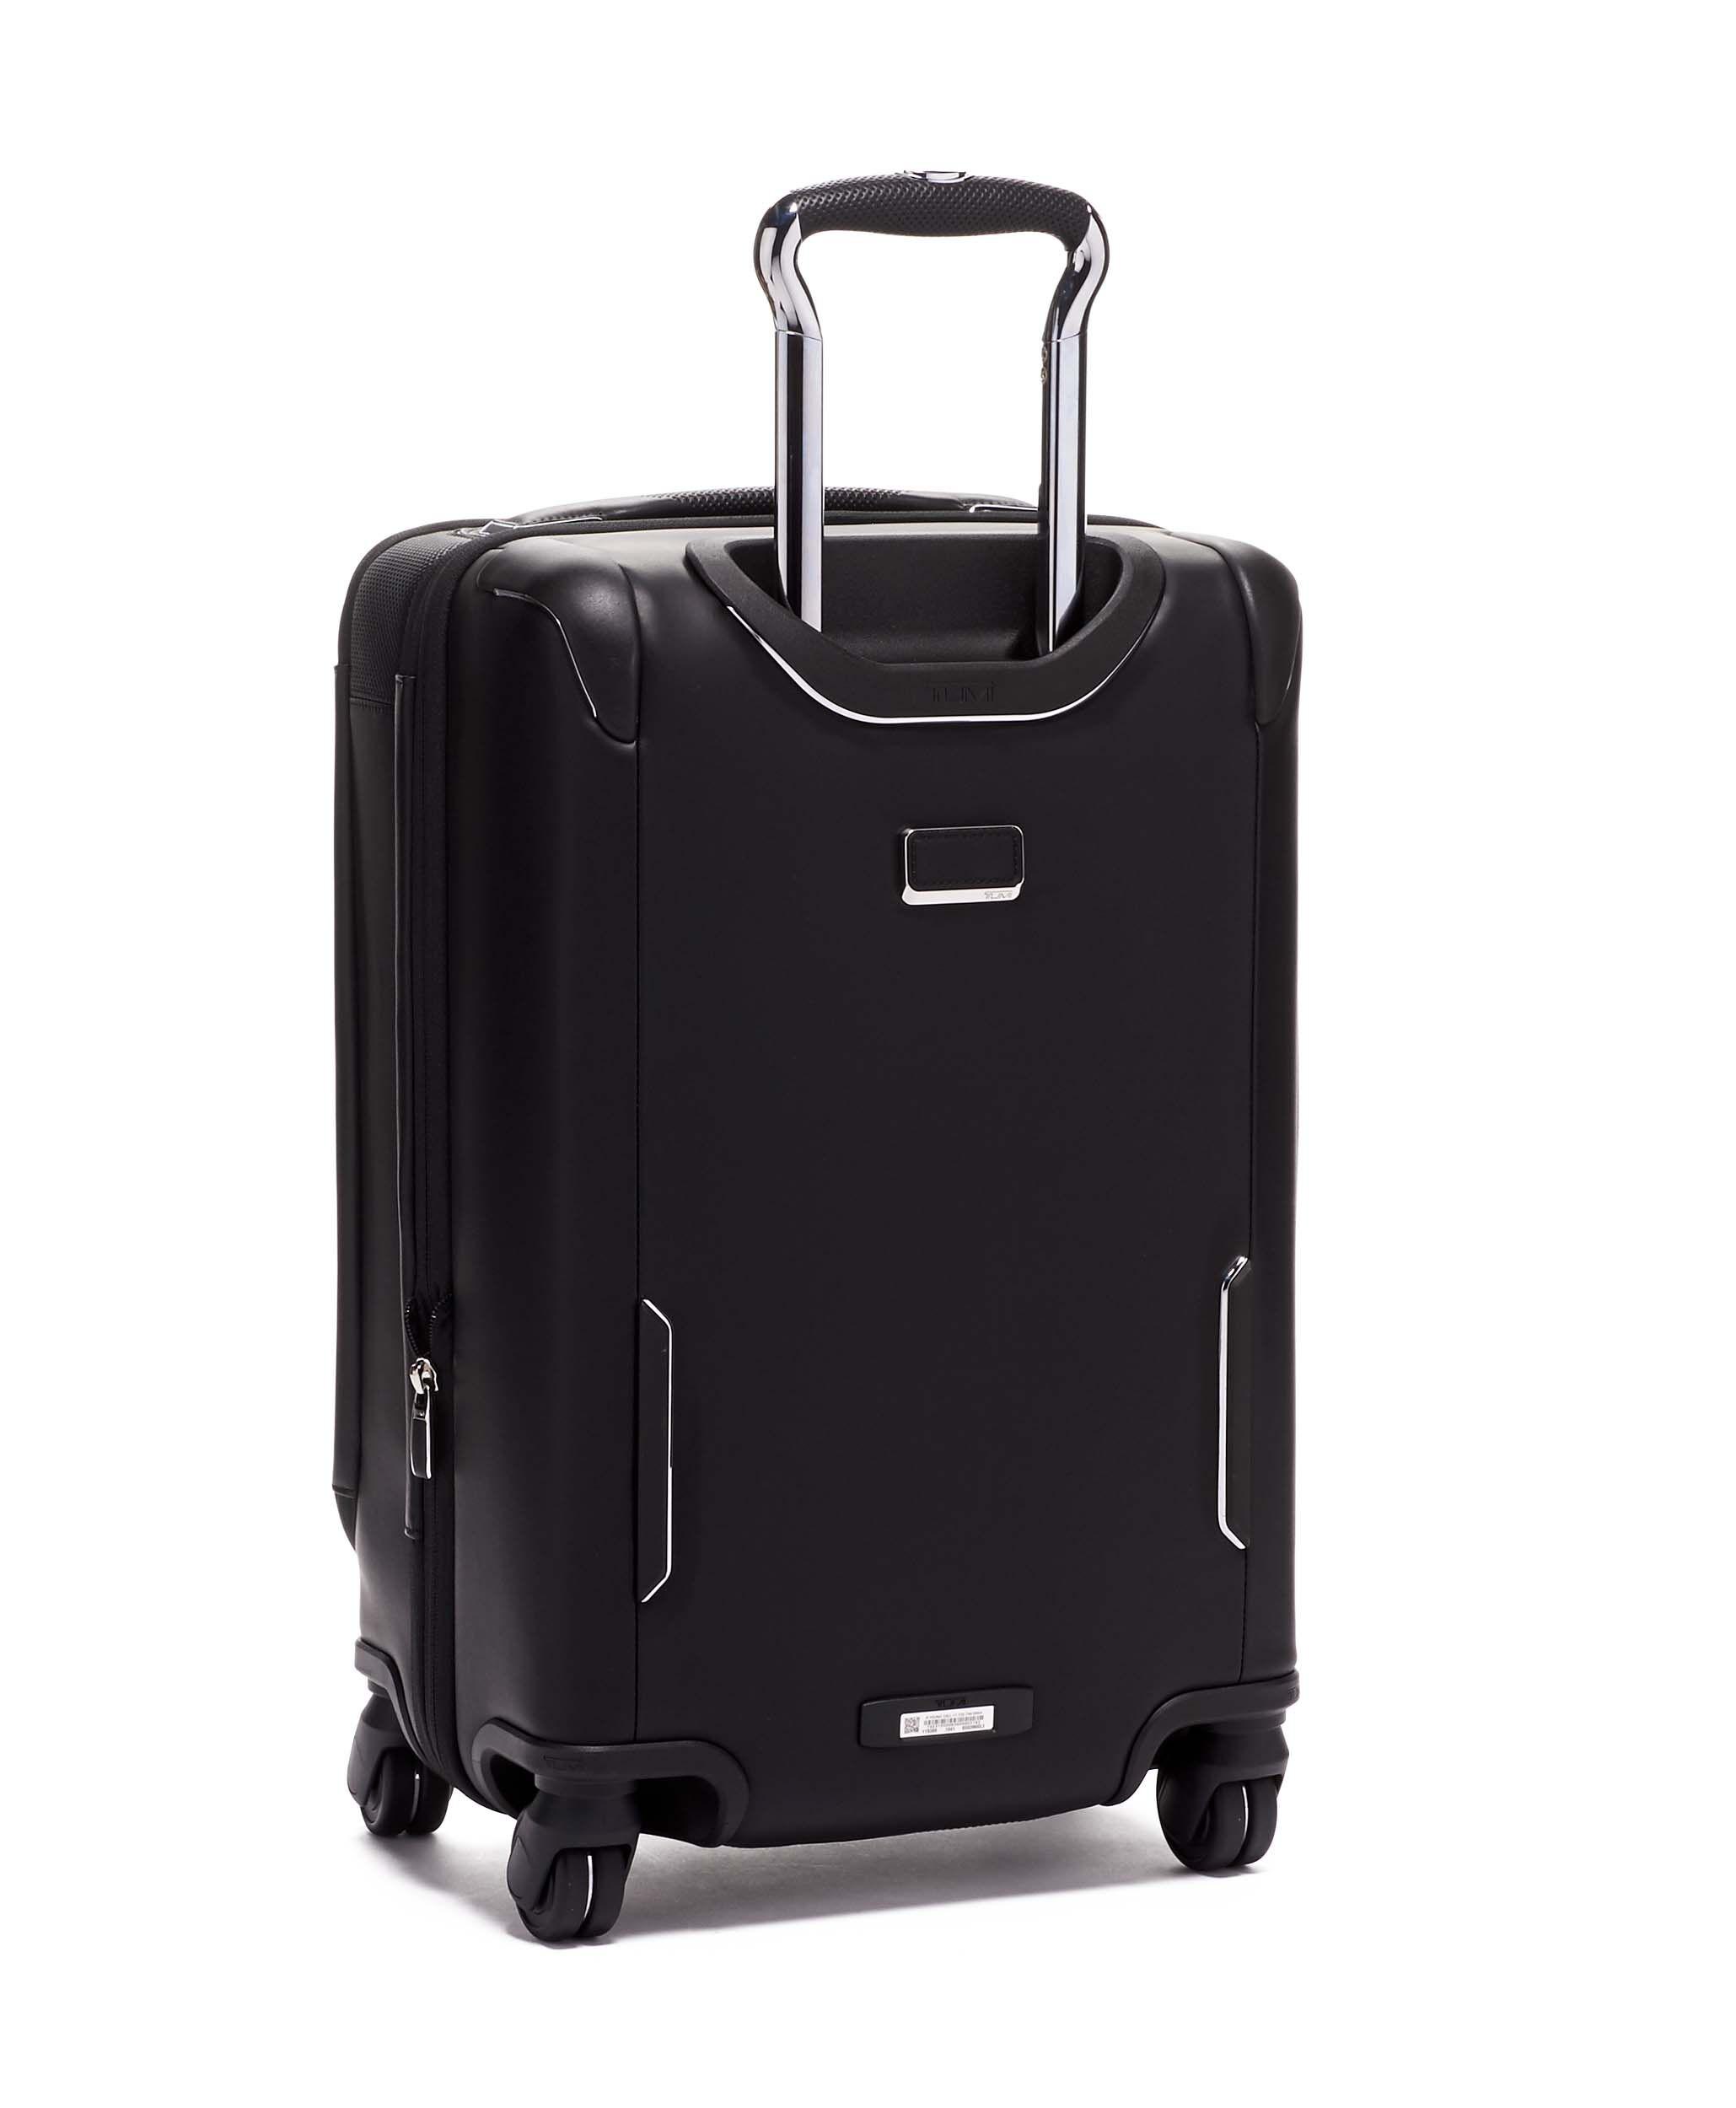 Gepäck, Messenger Bags, Tragetaschen, Reisetaschen & Rucksäcke